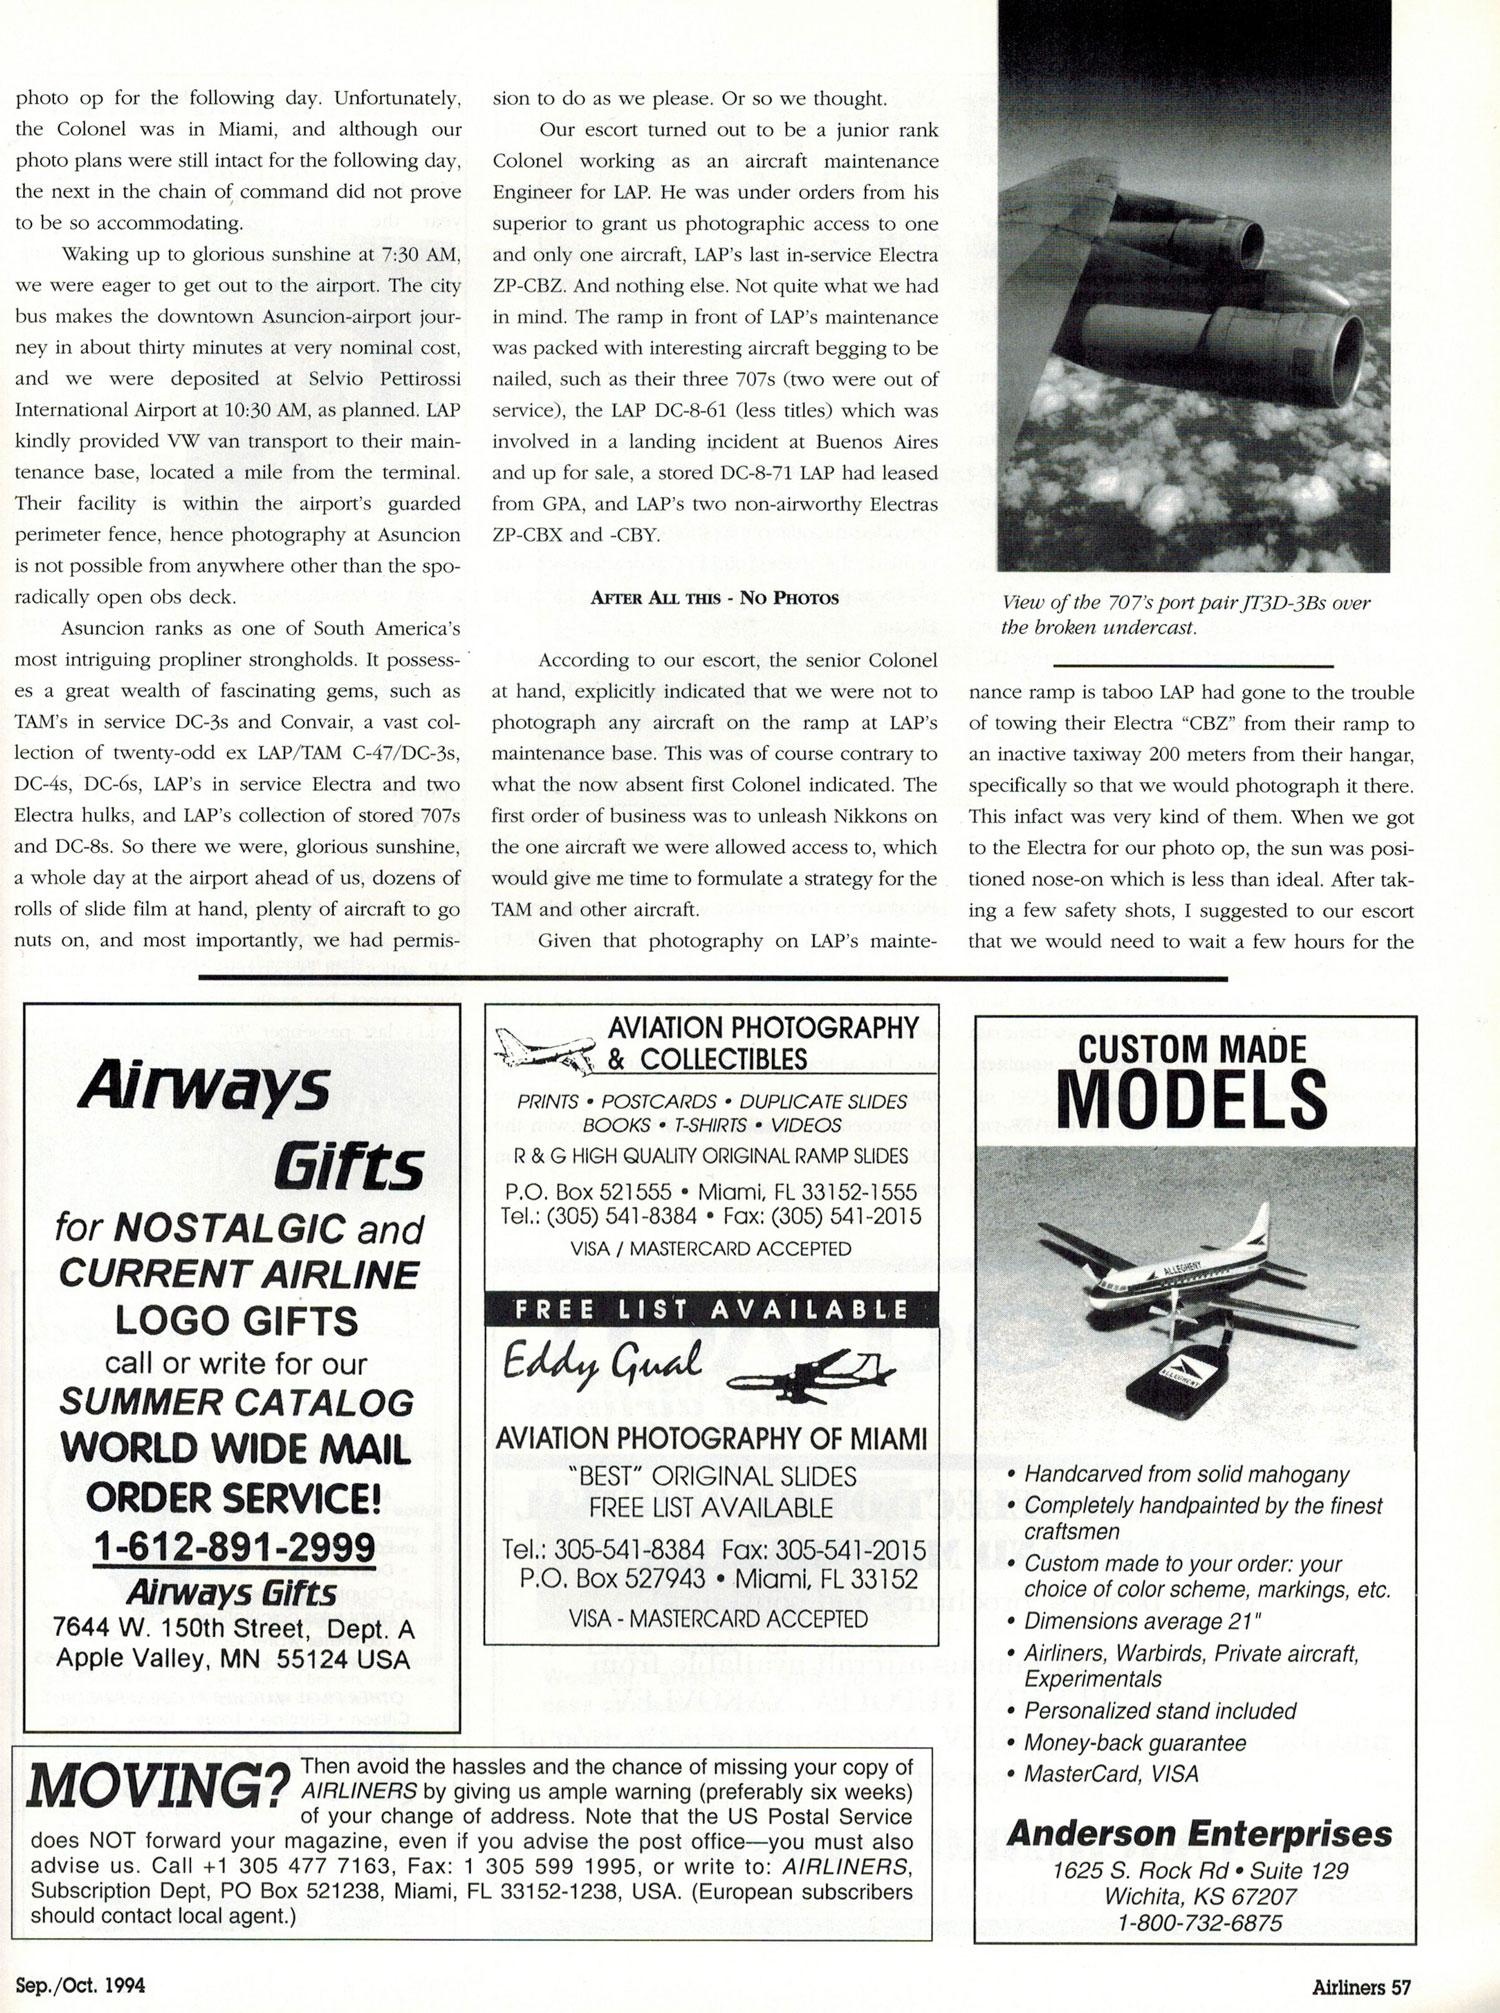 Paraguayan Pleasures: Latin America's Last Passenger 707